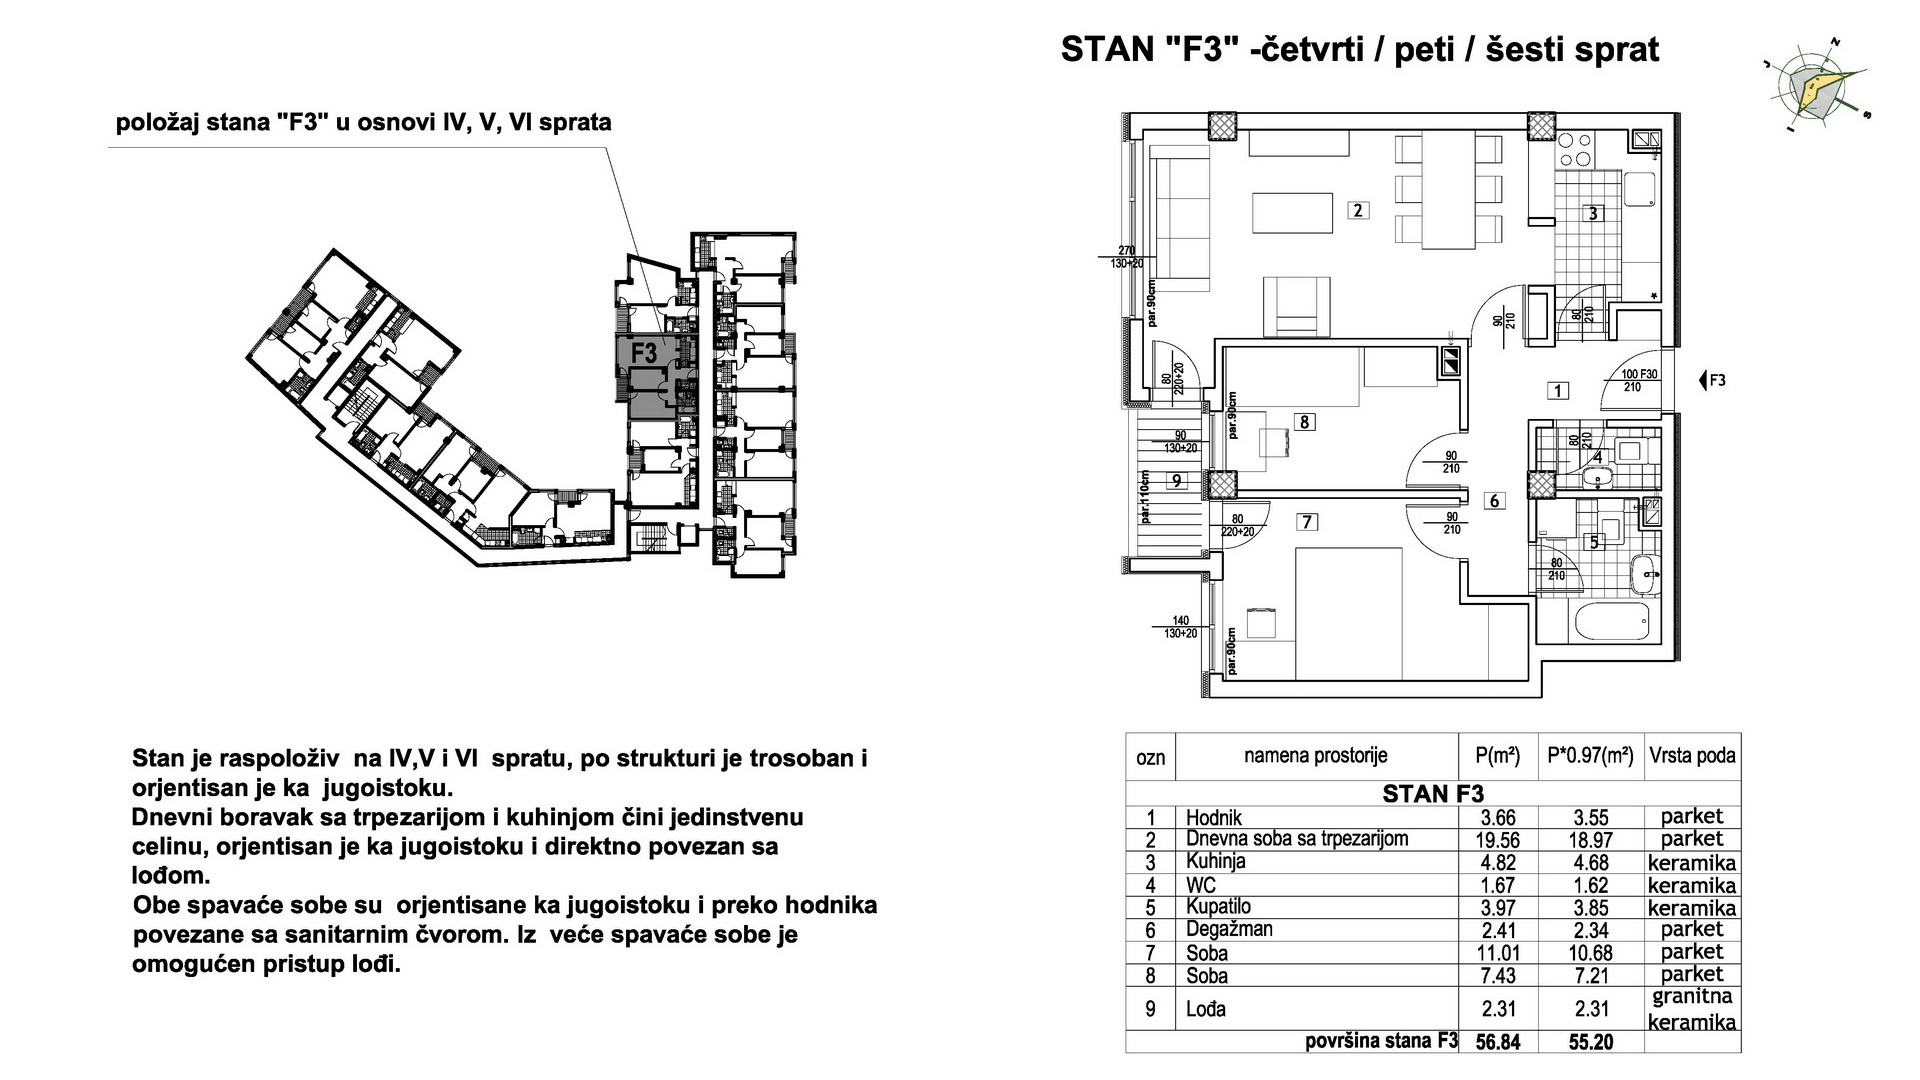 Objekat u Prešernovoj bb - Stan F3